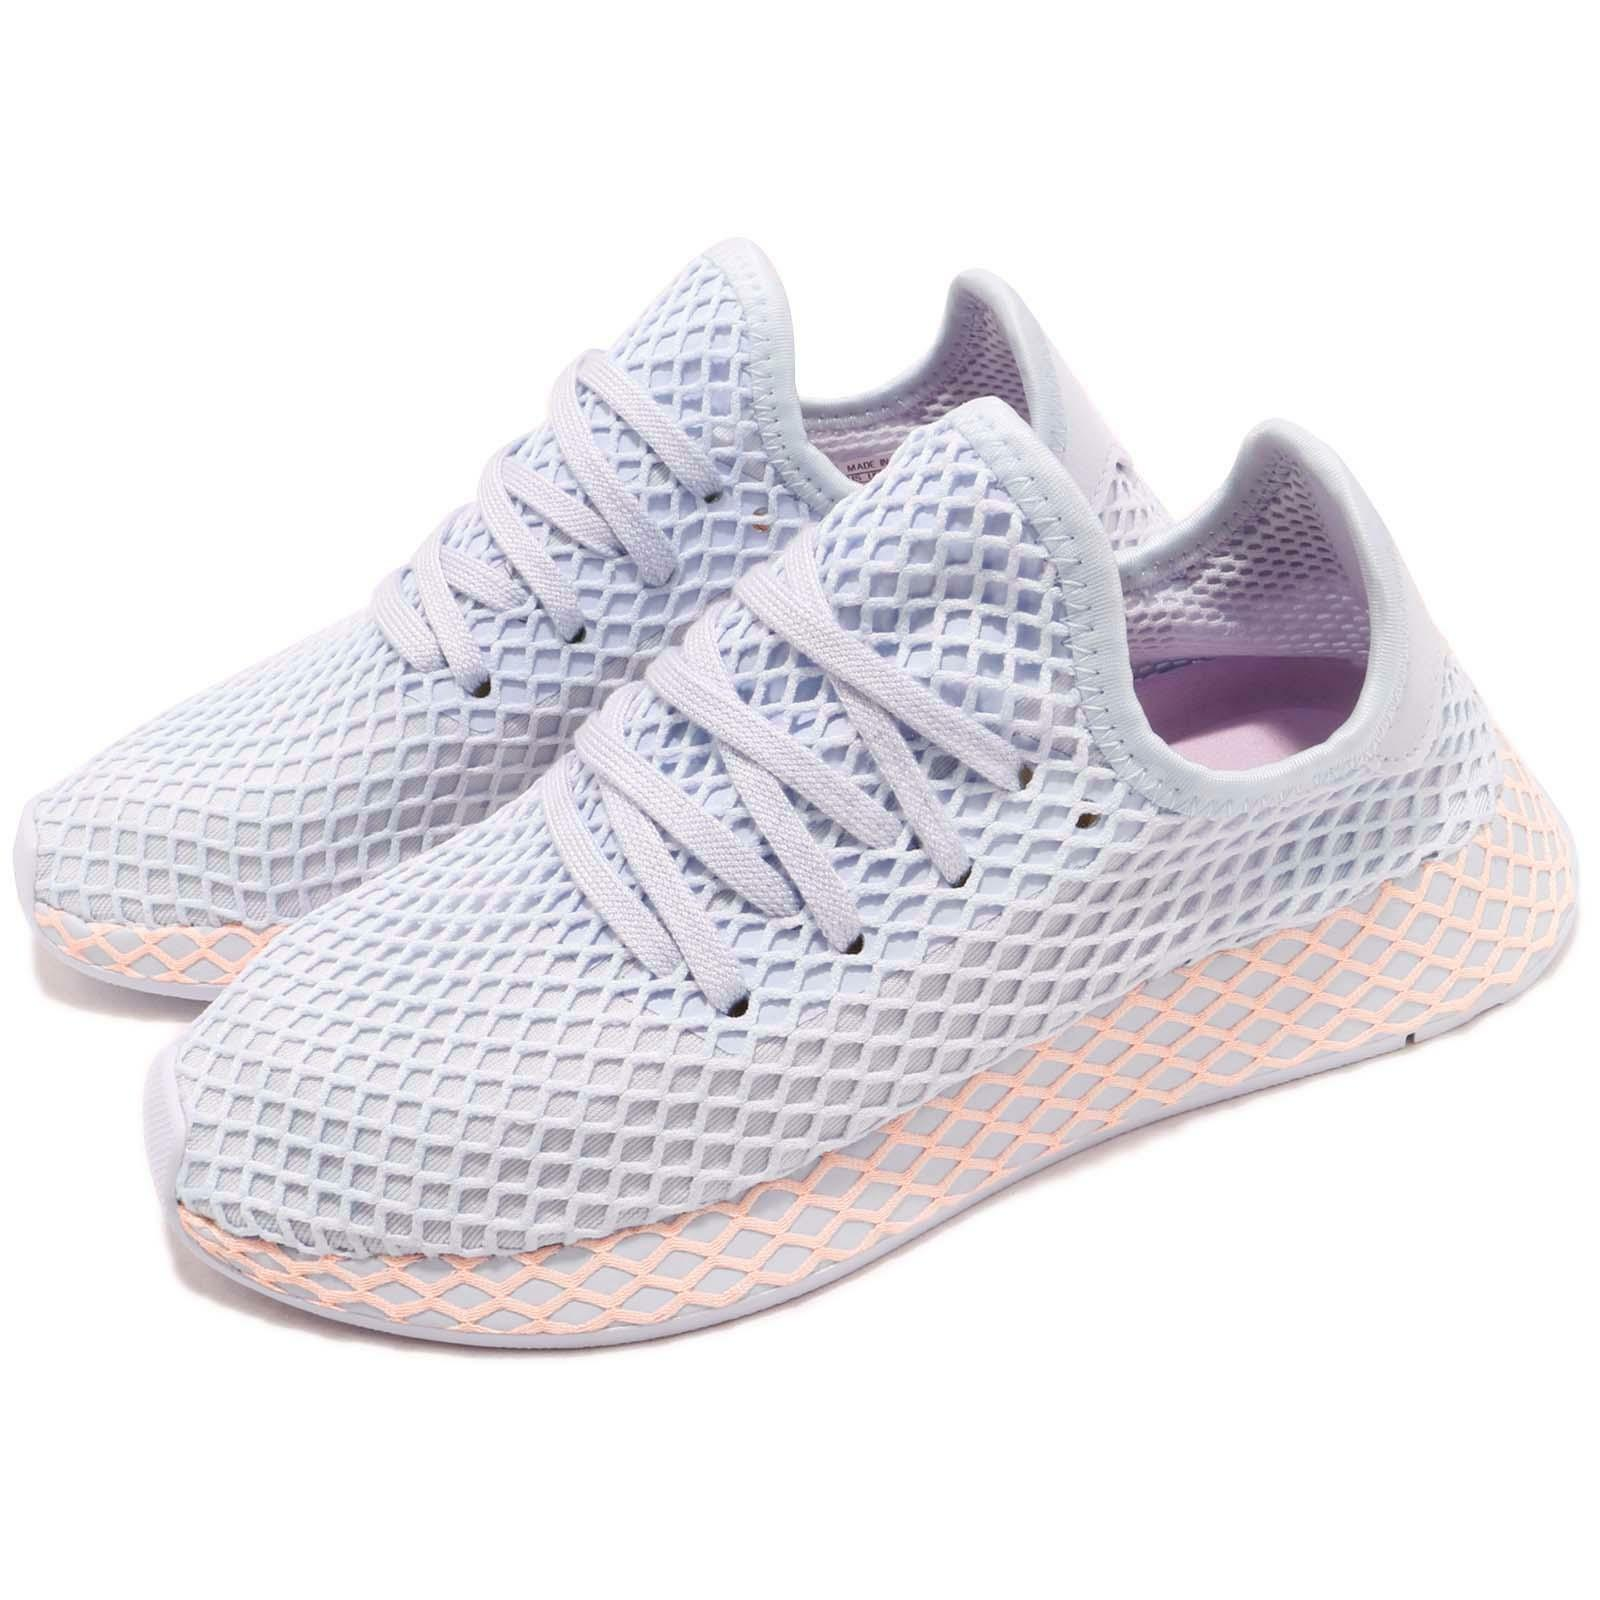 Adidas Originals Deerupt W Runner Aero bluee Clear orange Running shoes B37878